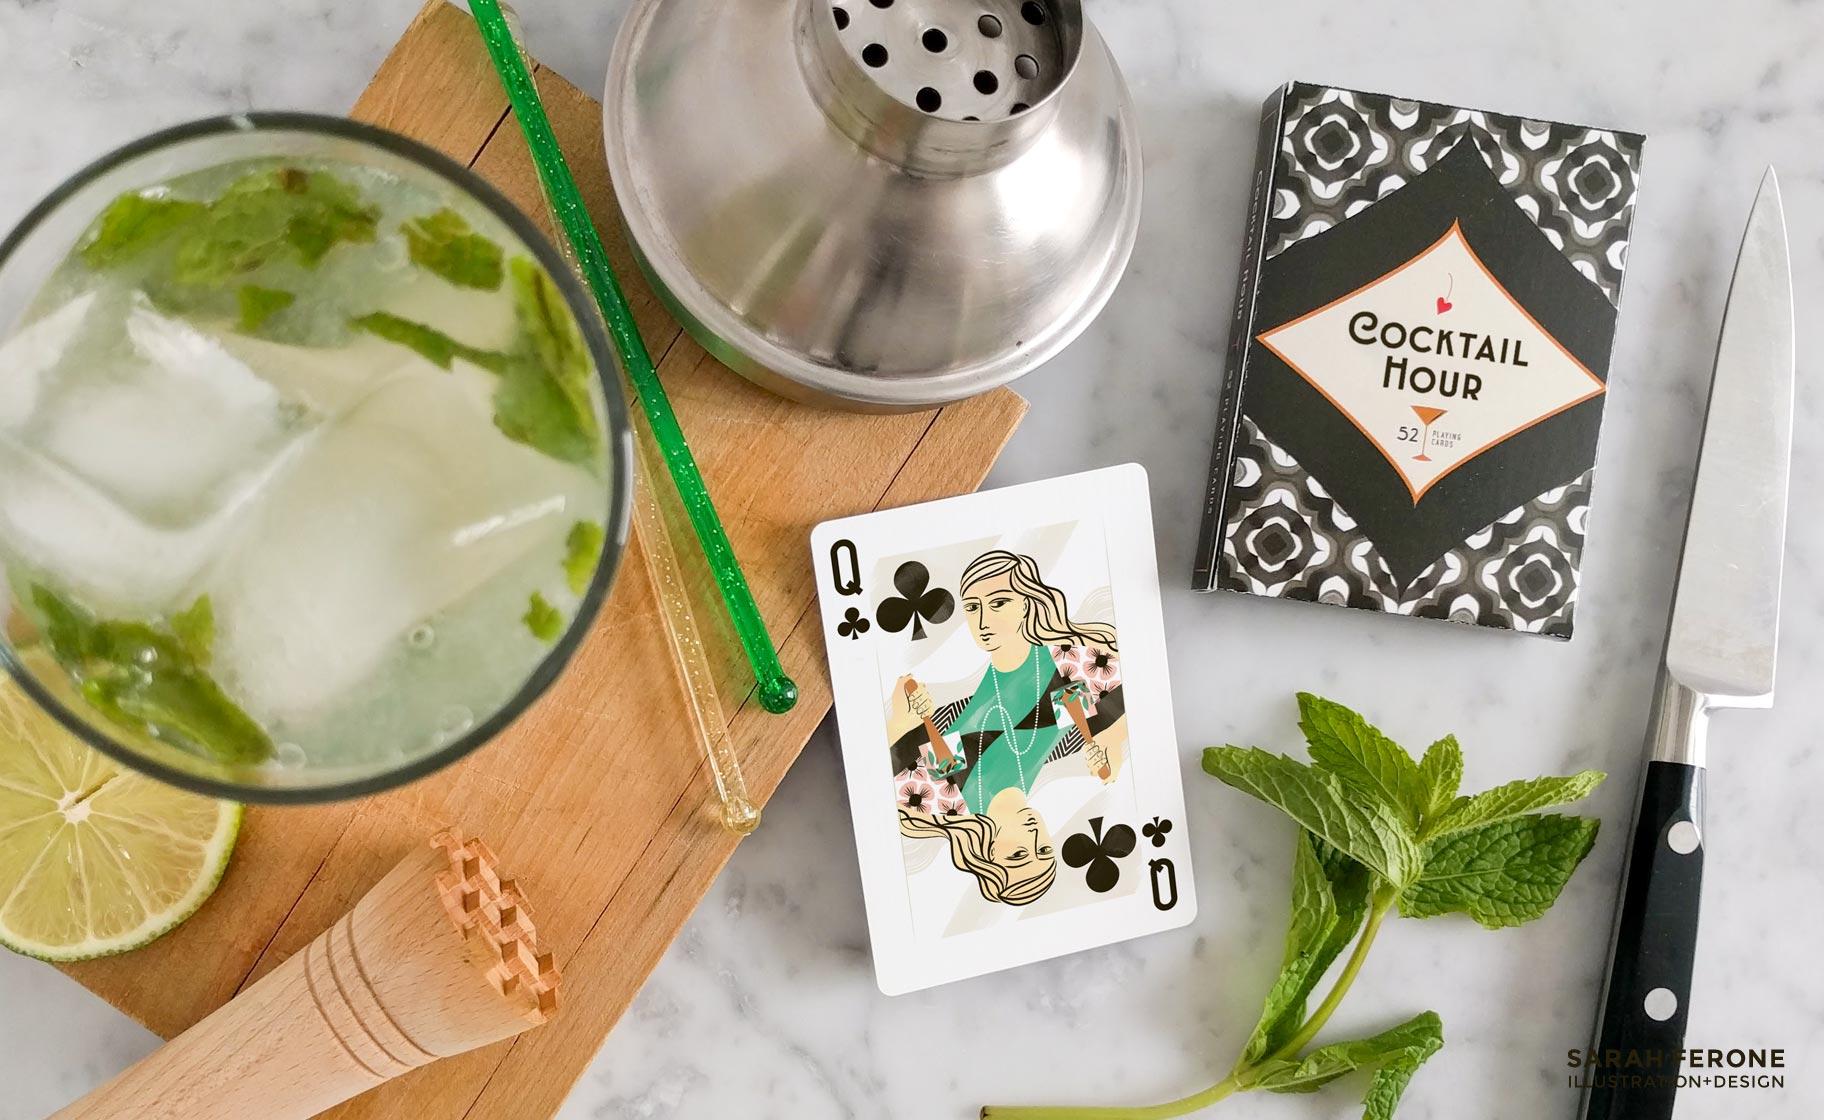 Sarah Ferone Cocktail Hour